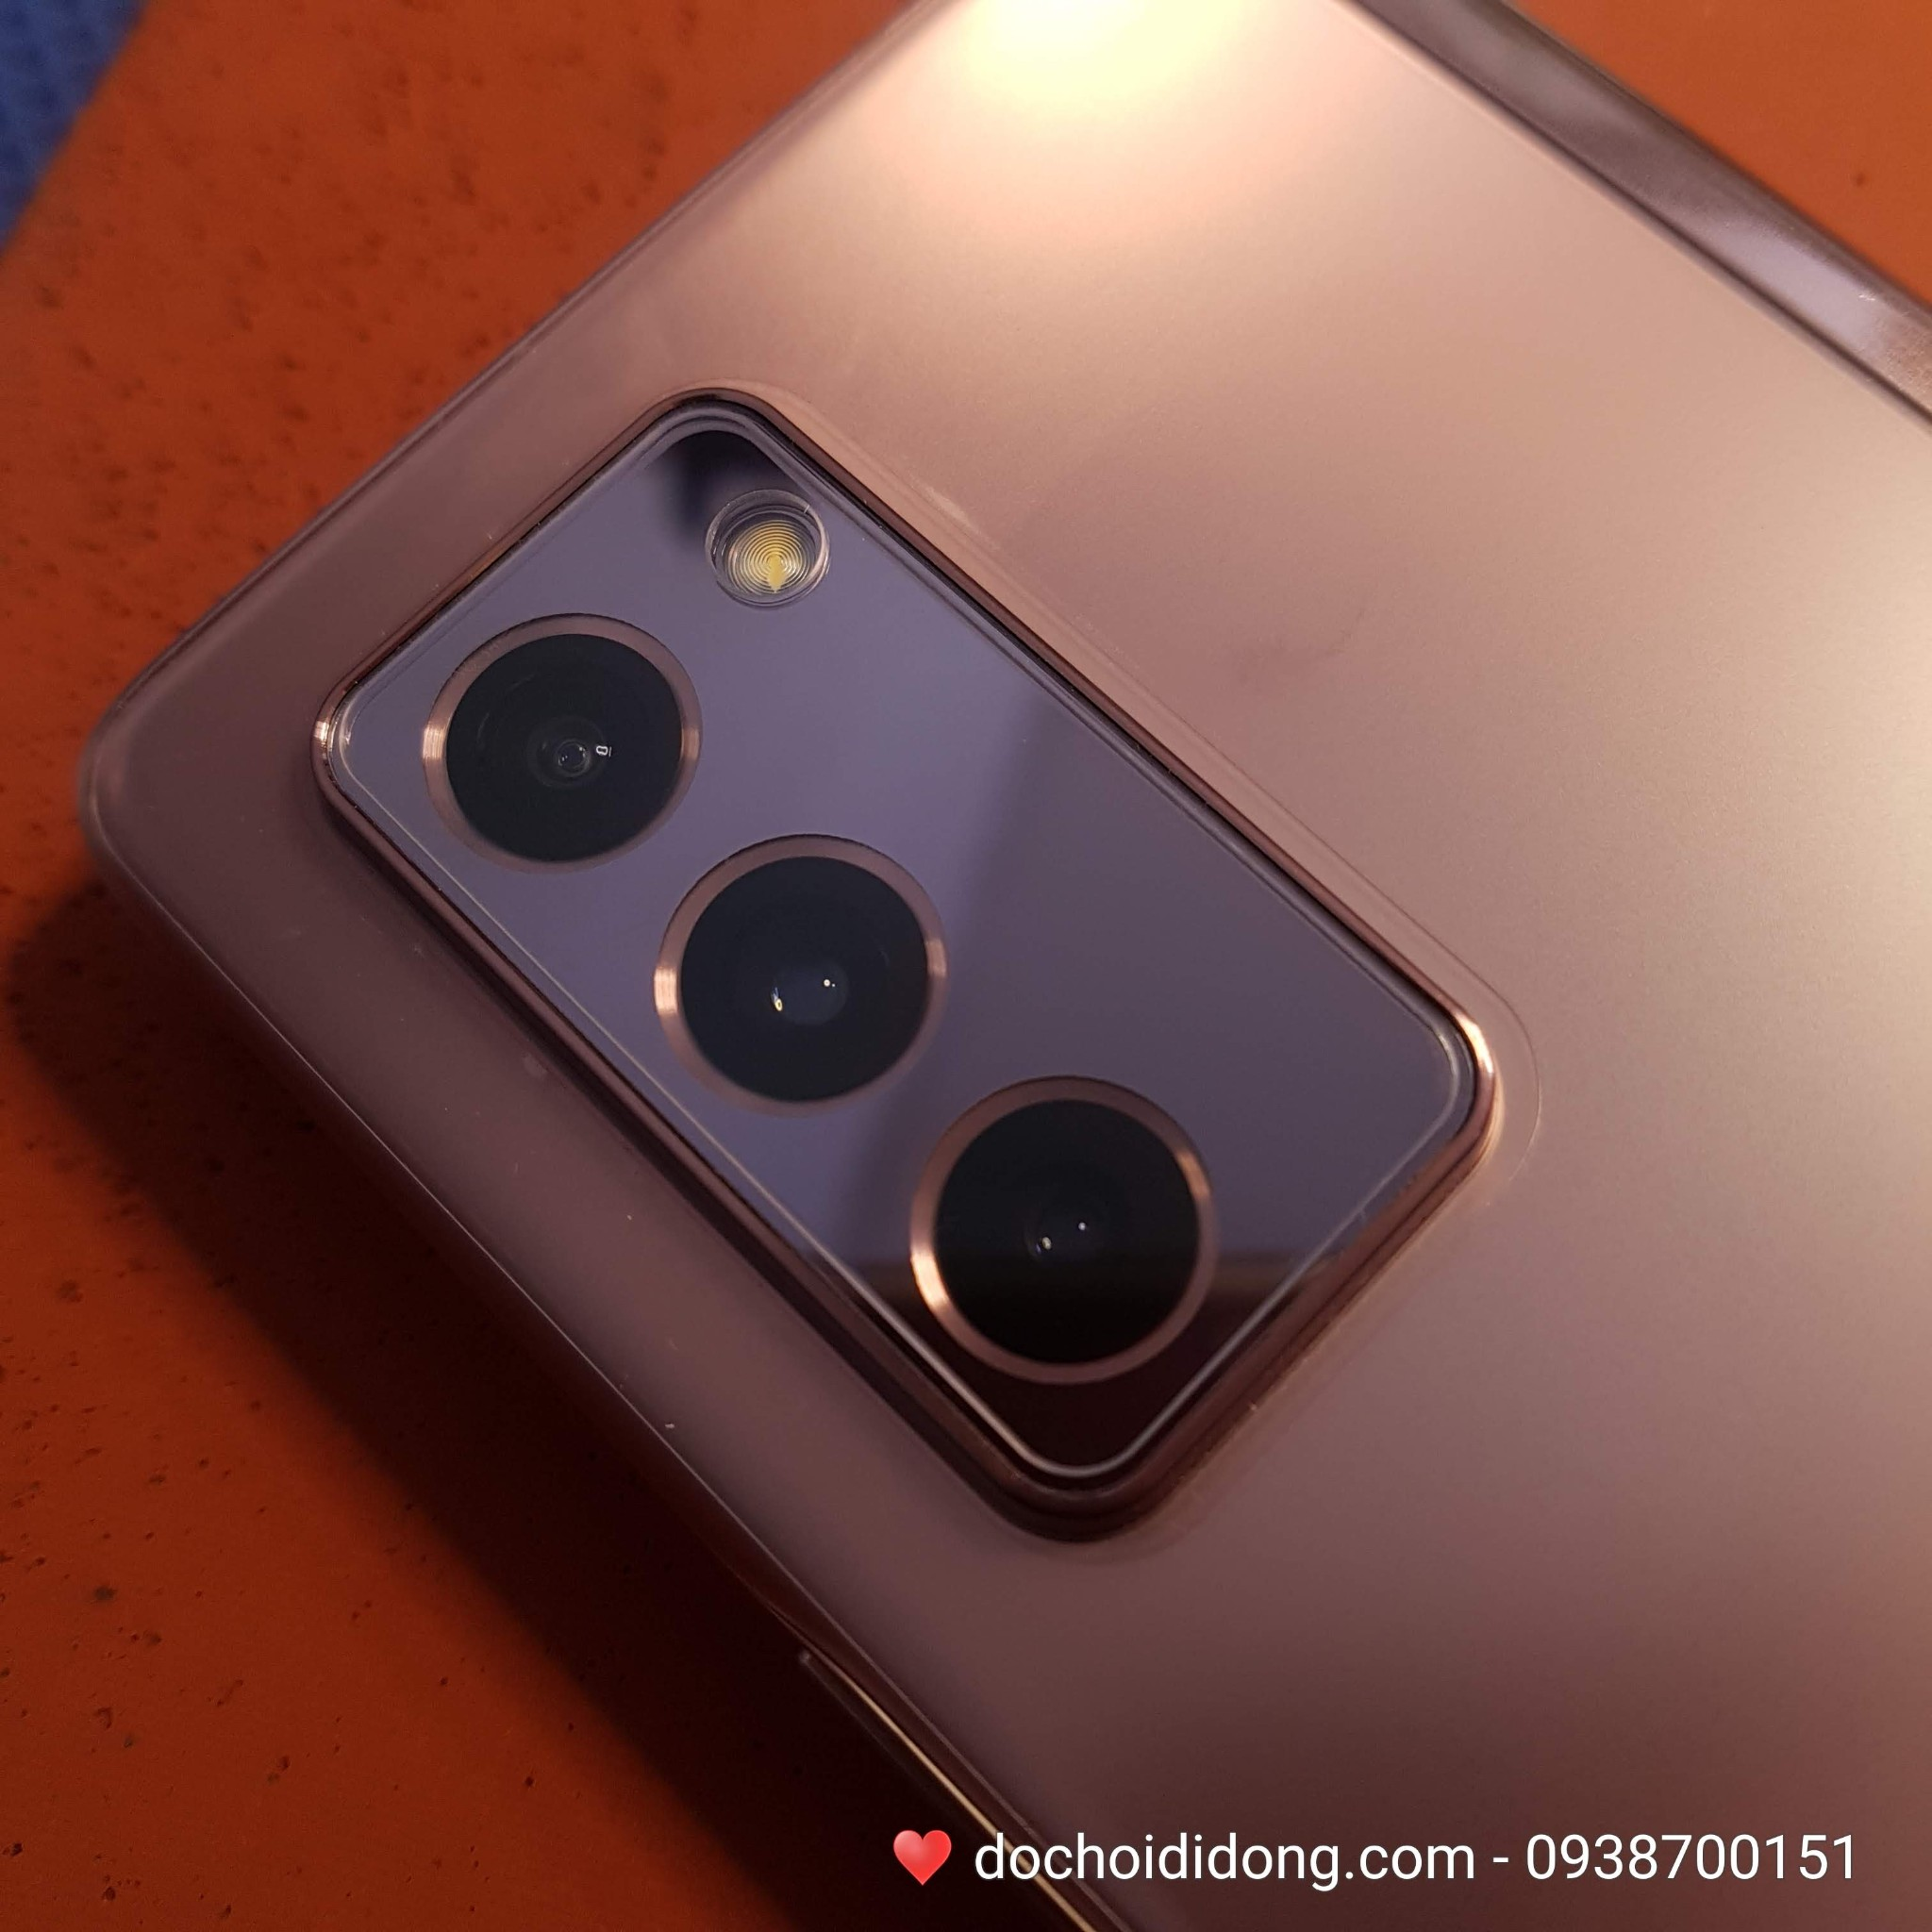 mieng-dan-cuong-luc-camera-samsung-z-fold-2-zacase-thuy-tinh-huu-co